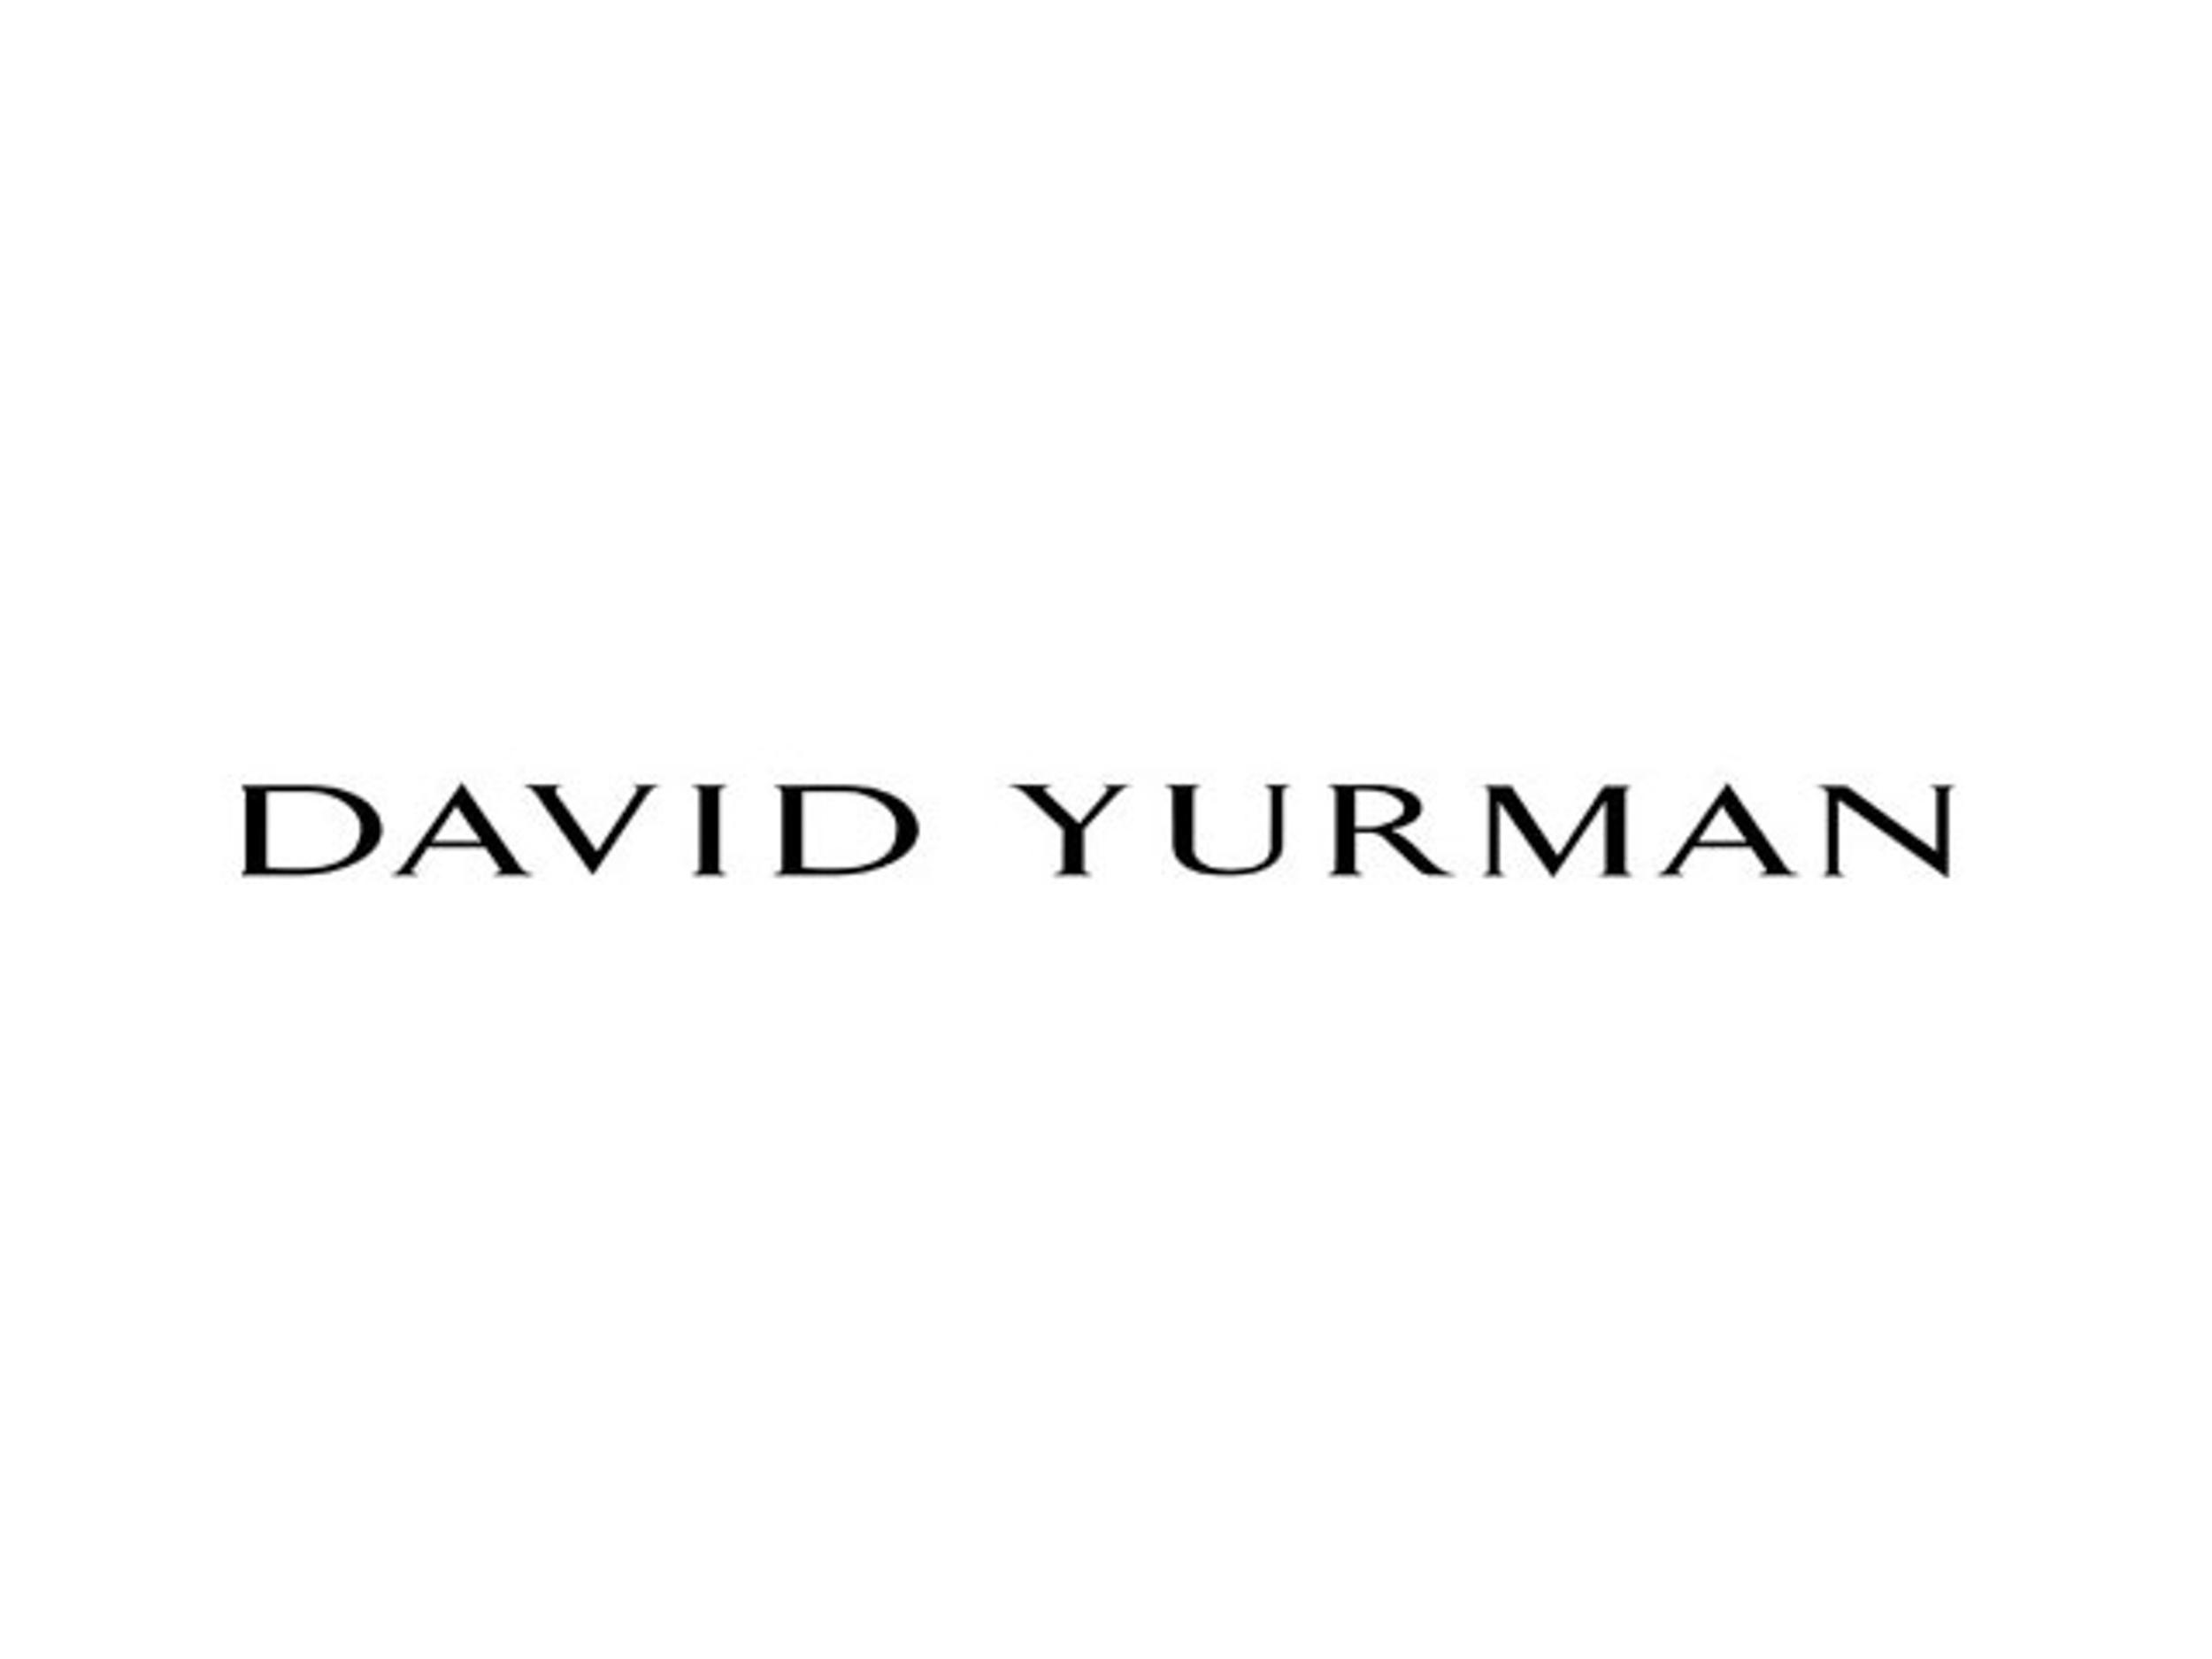 logo_yurman_cropped_med1-1.jpg